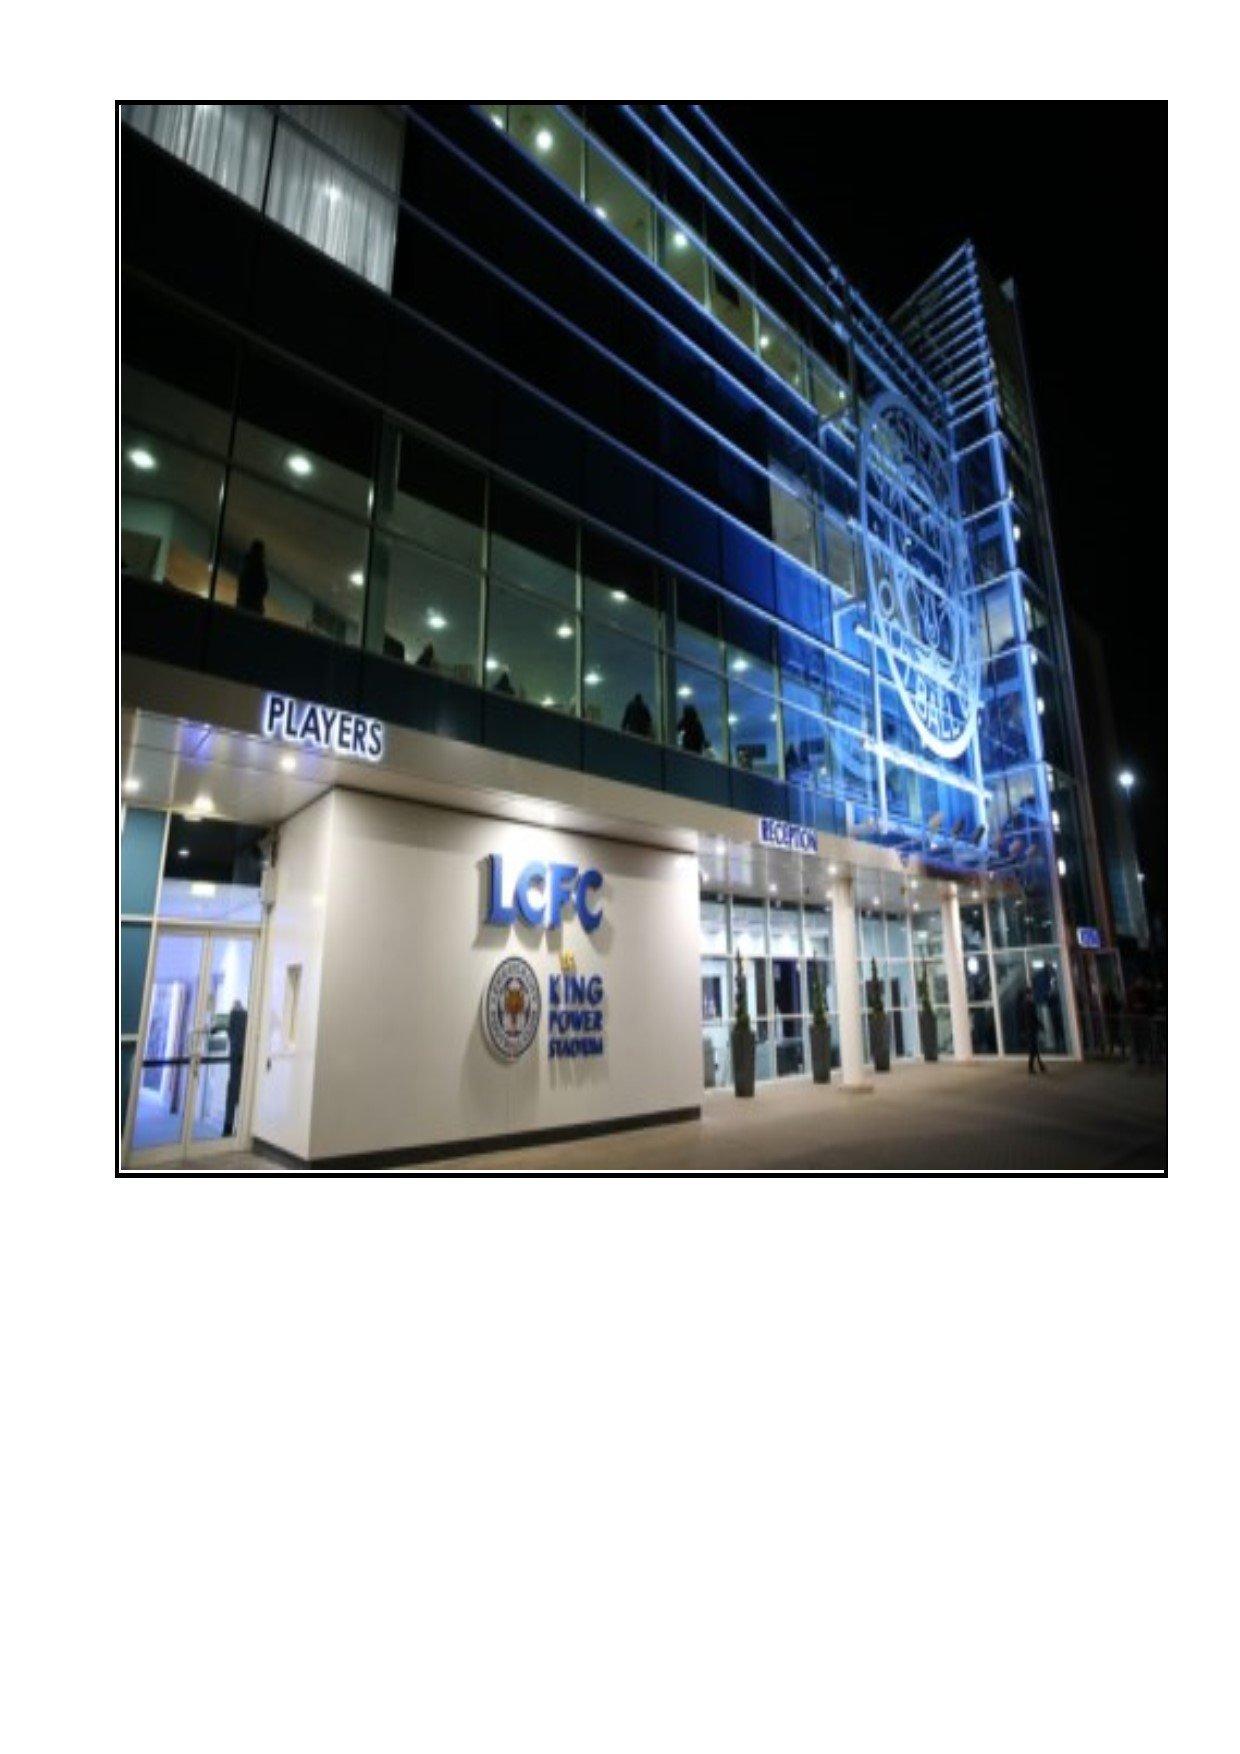 1600 People 10 Djs 3 Rooms 1 Venue The Big Soul Night flyer